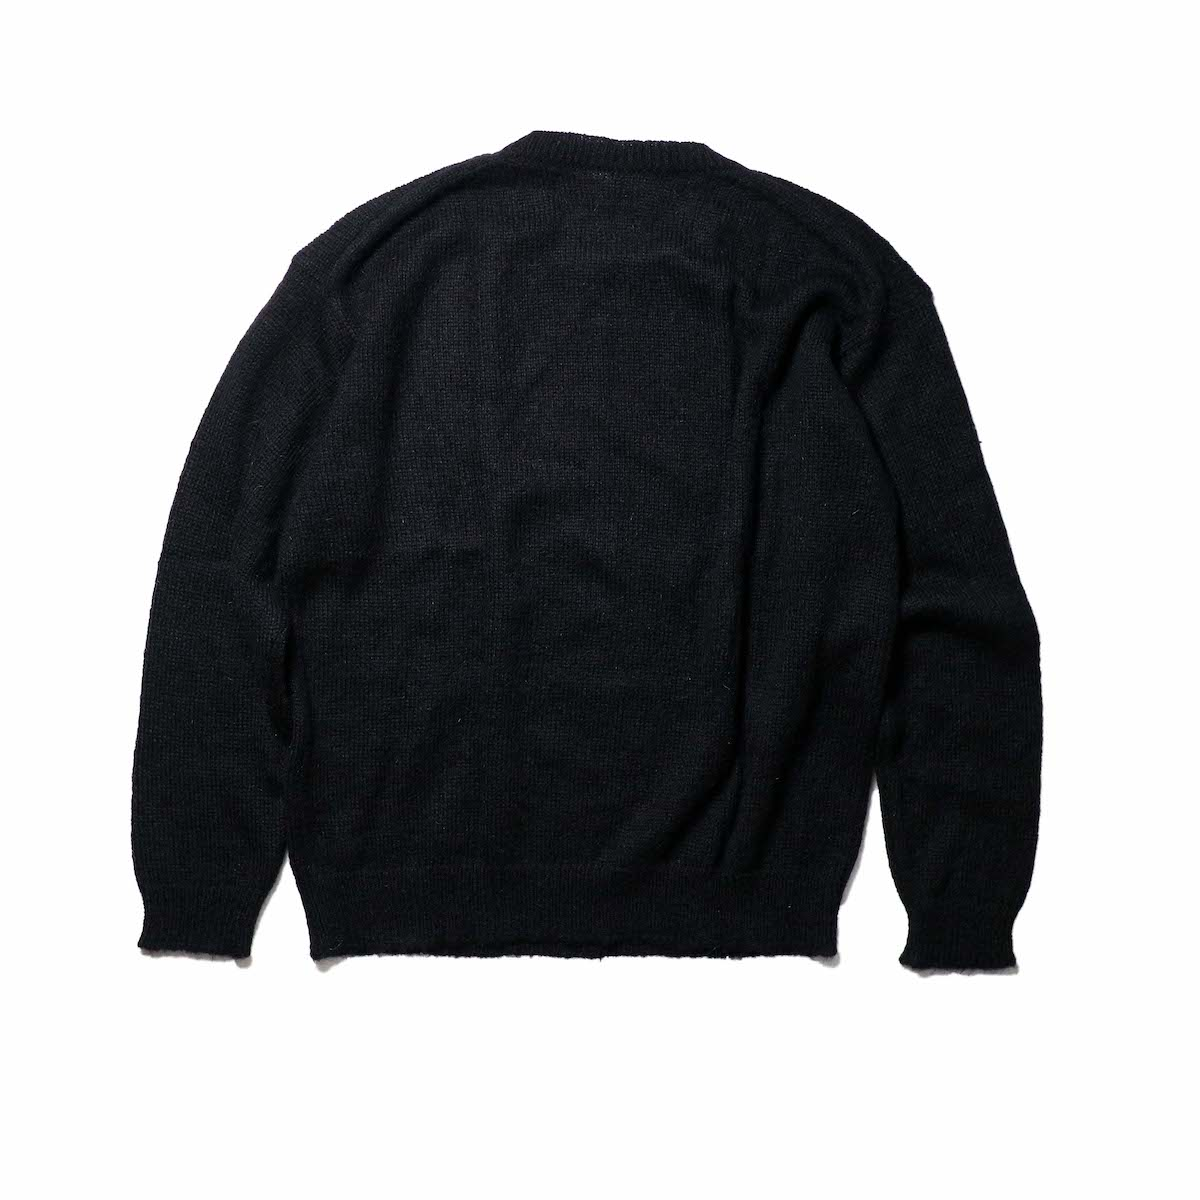 FLAMAND / Mohair Basic (Black)背面